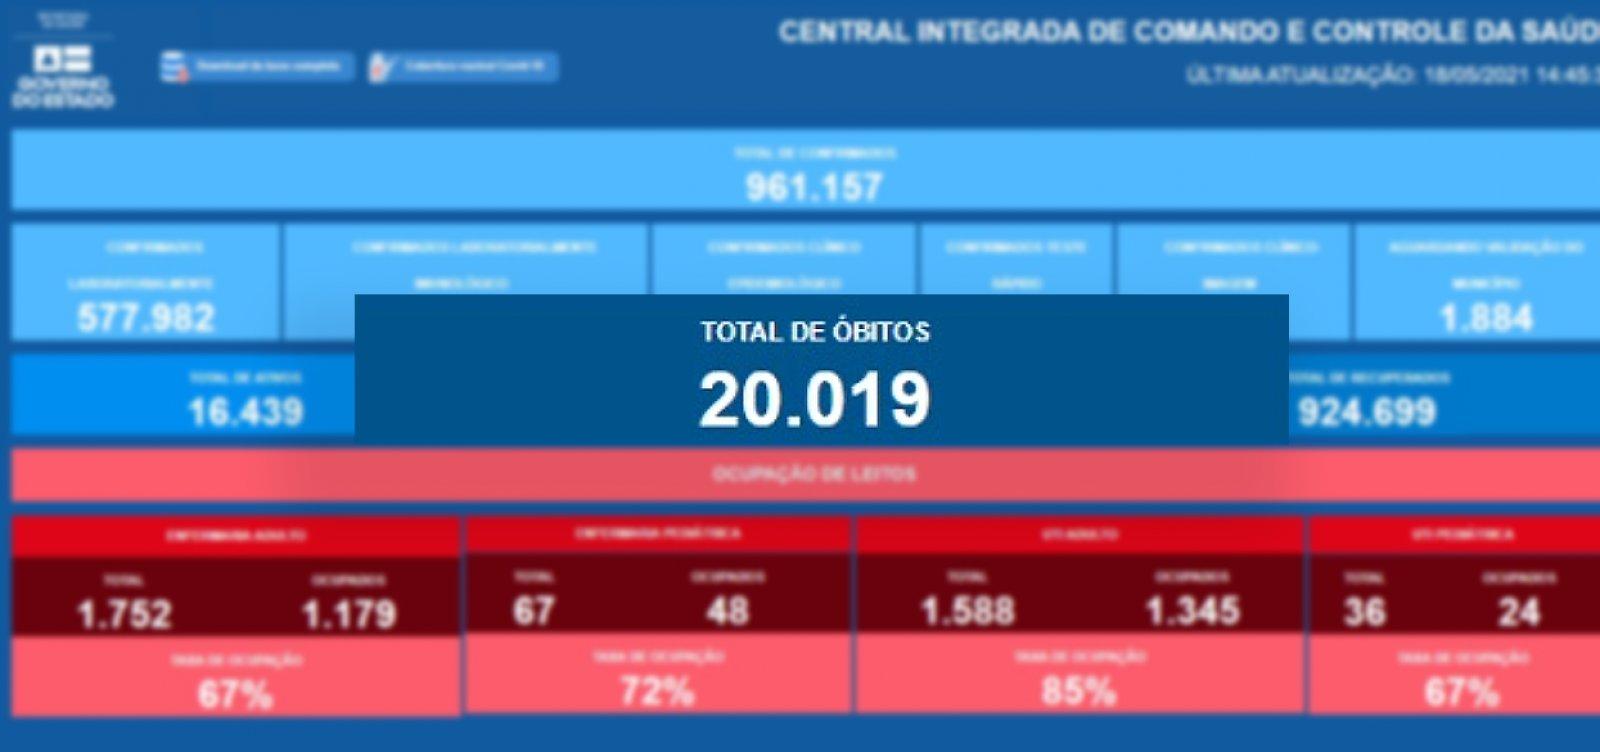 Após 14 meses de pandemia, Bahia ultrapassa marca de 20 mil mortes por Covid-19